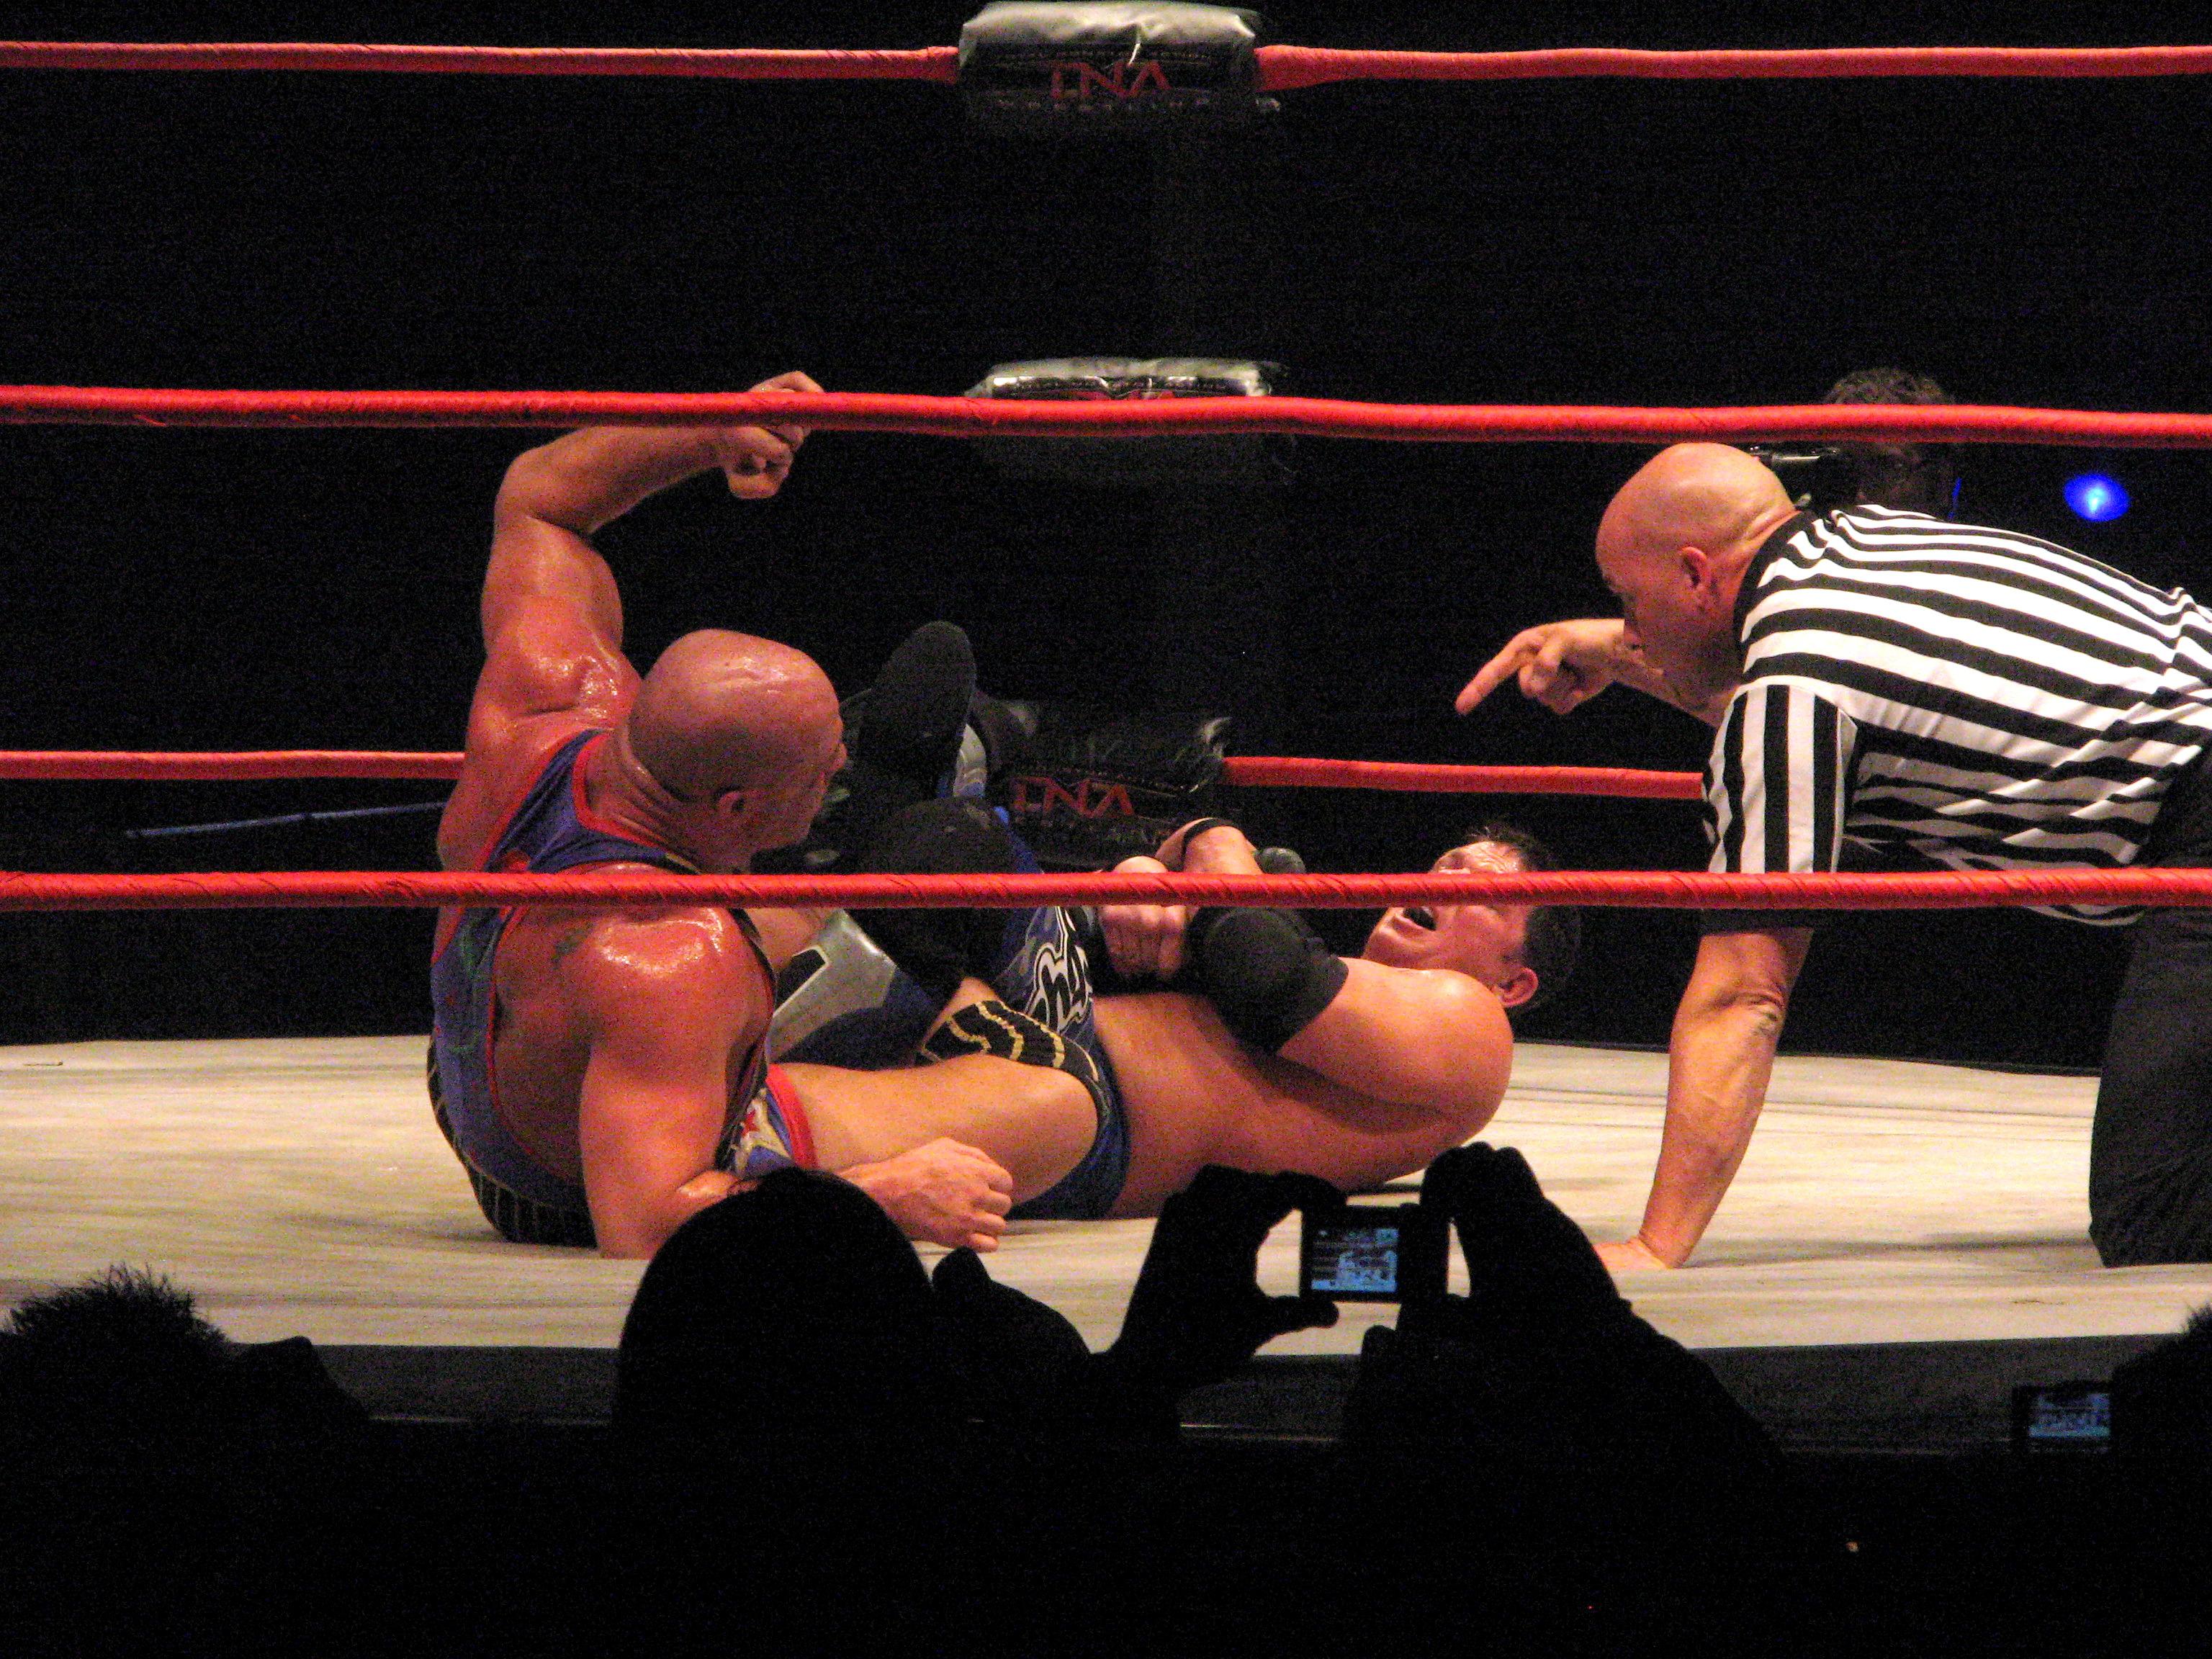 Styles applying a figure-four leglock on Kurt Angle.